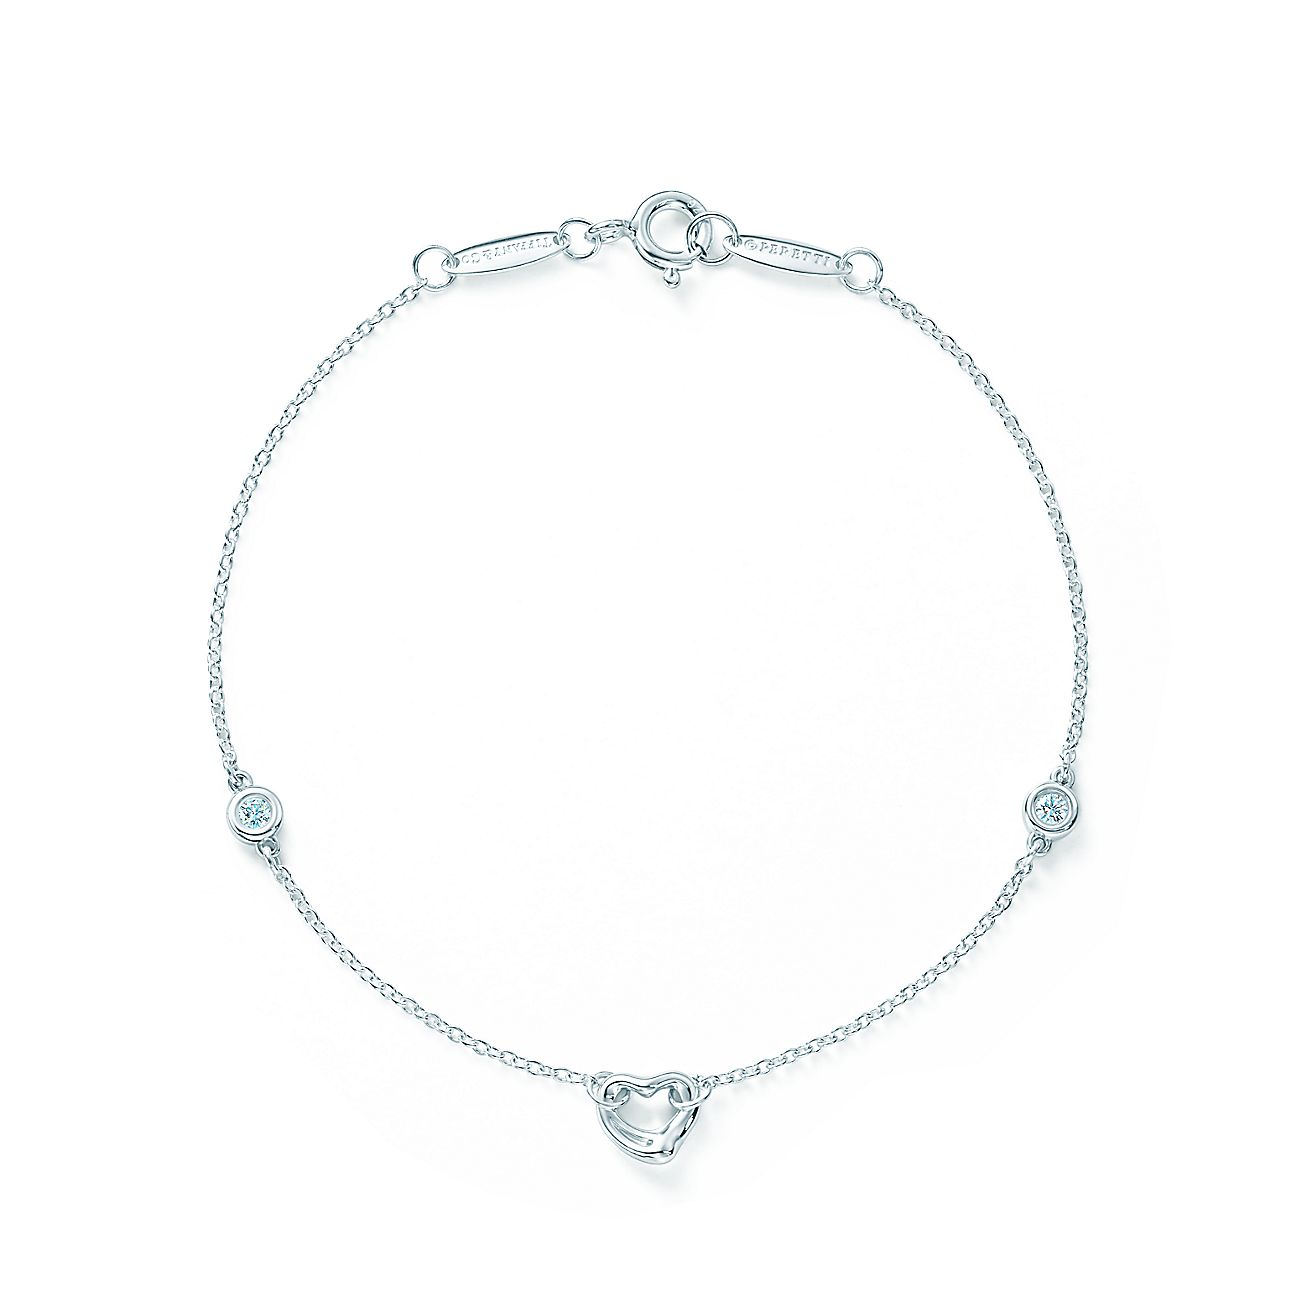 Elsa peretti diamonds by the yard open heart bracelet in for Diamonds by the yard ring